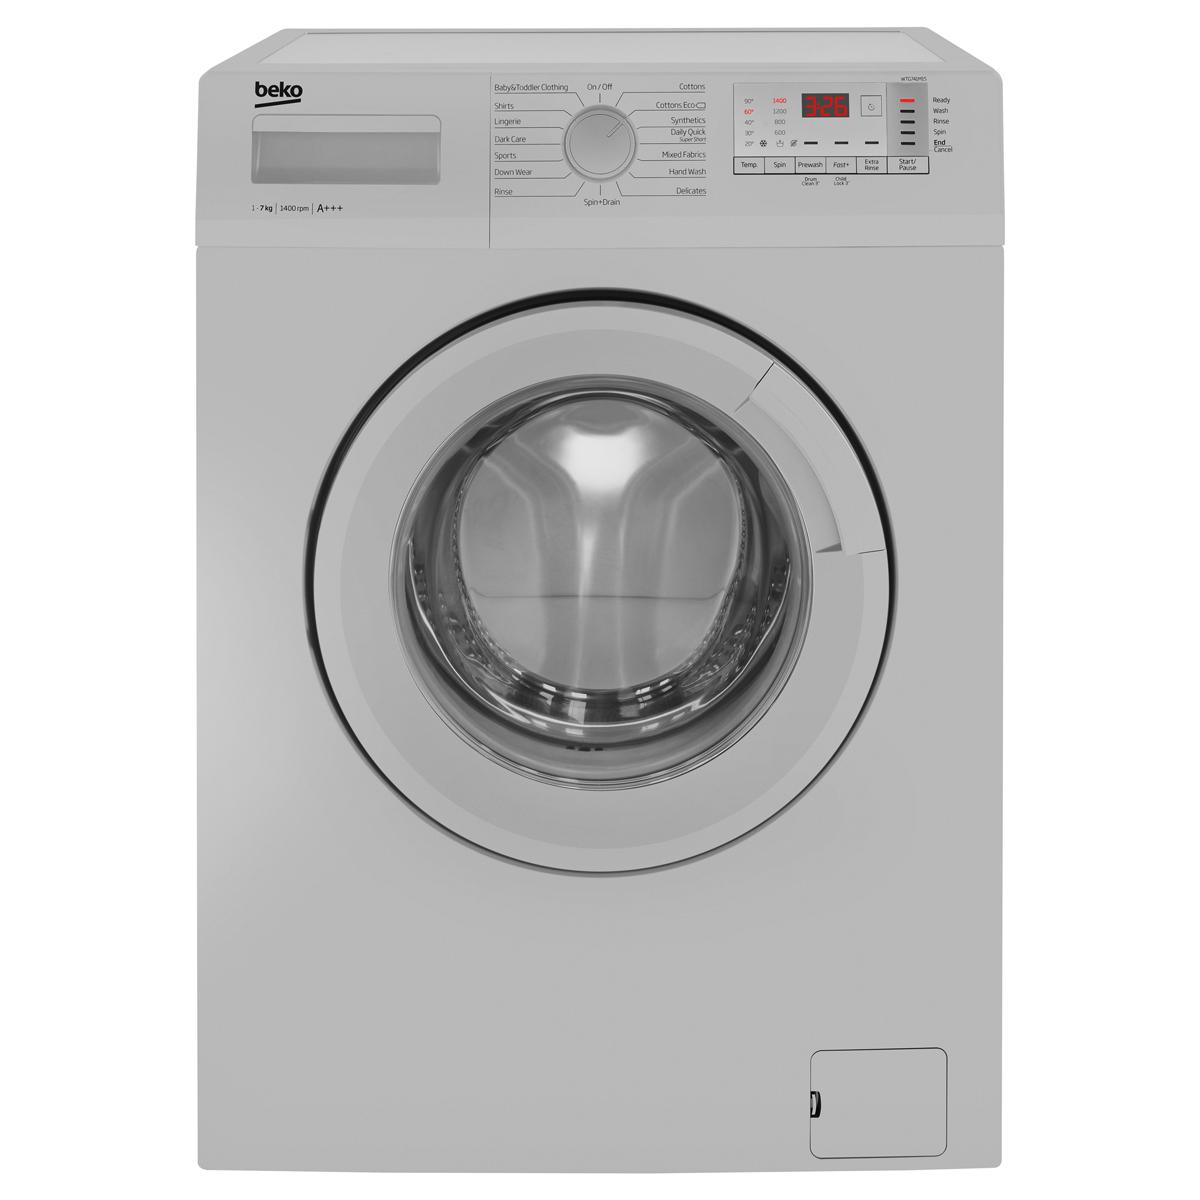 Beko WTG741M1S Washing Machine Freestanding 1400rpm 7kg A+++ Silver